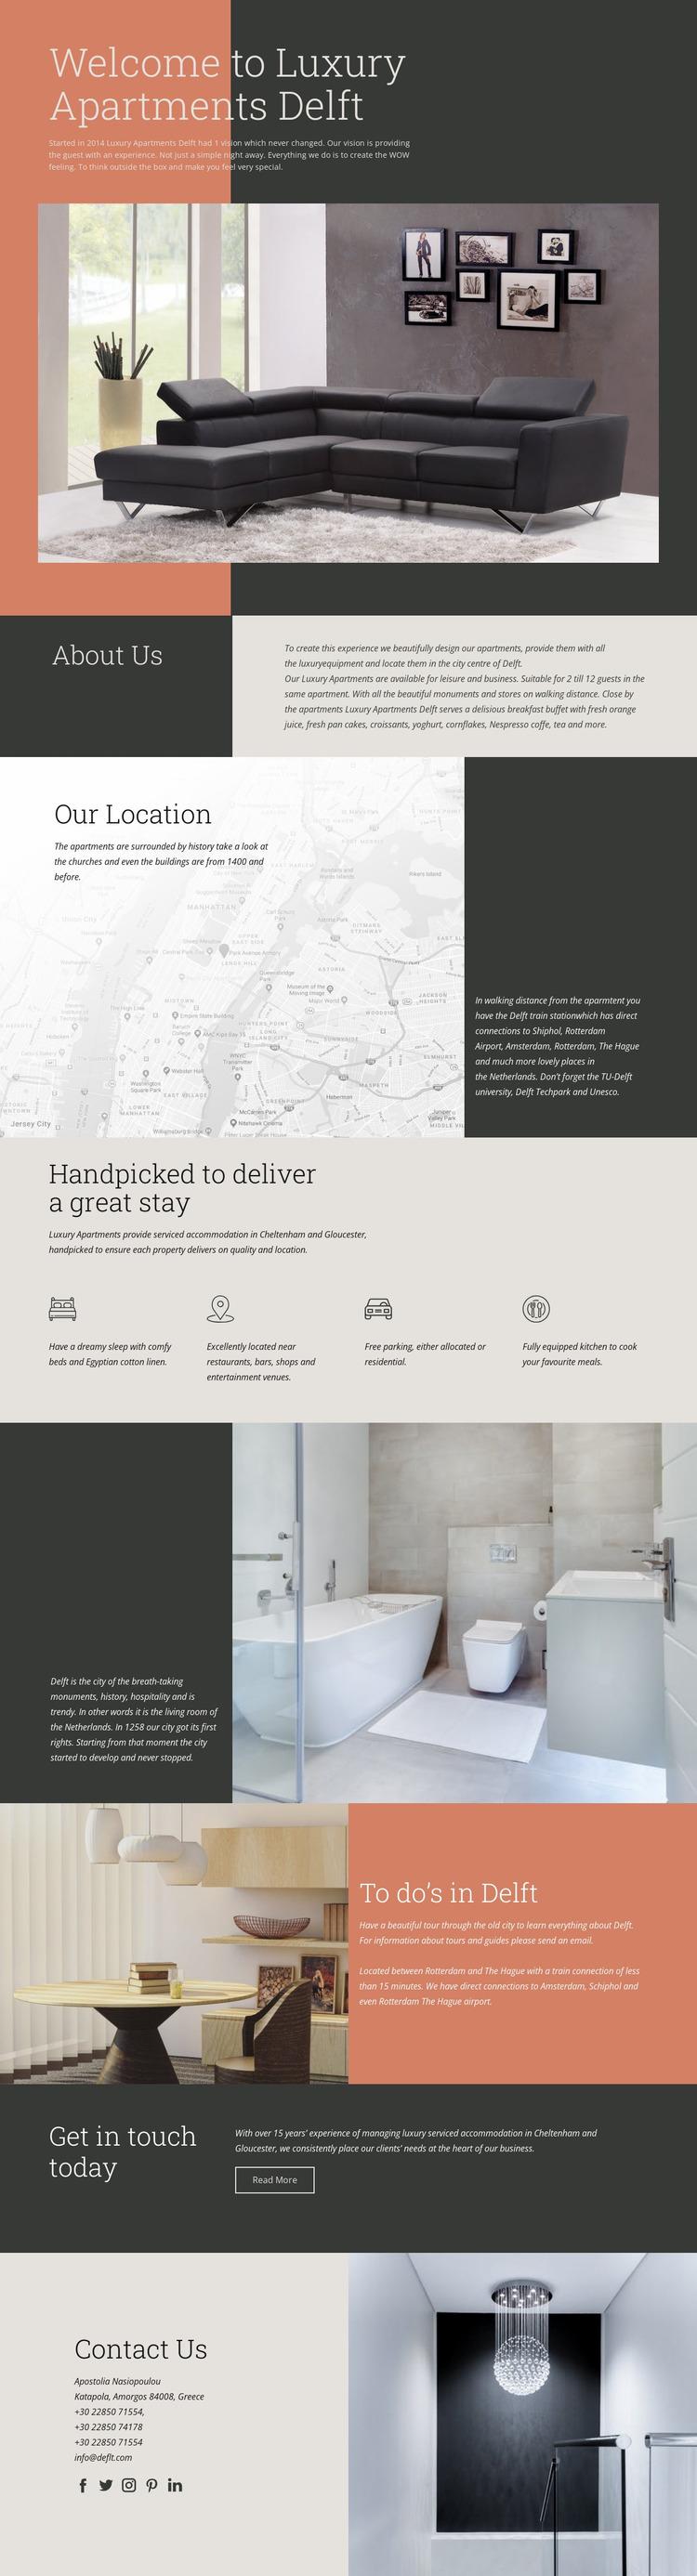 Luxury Apartments Website Mockup